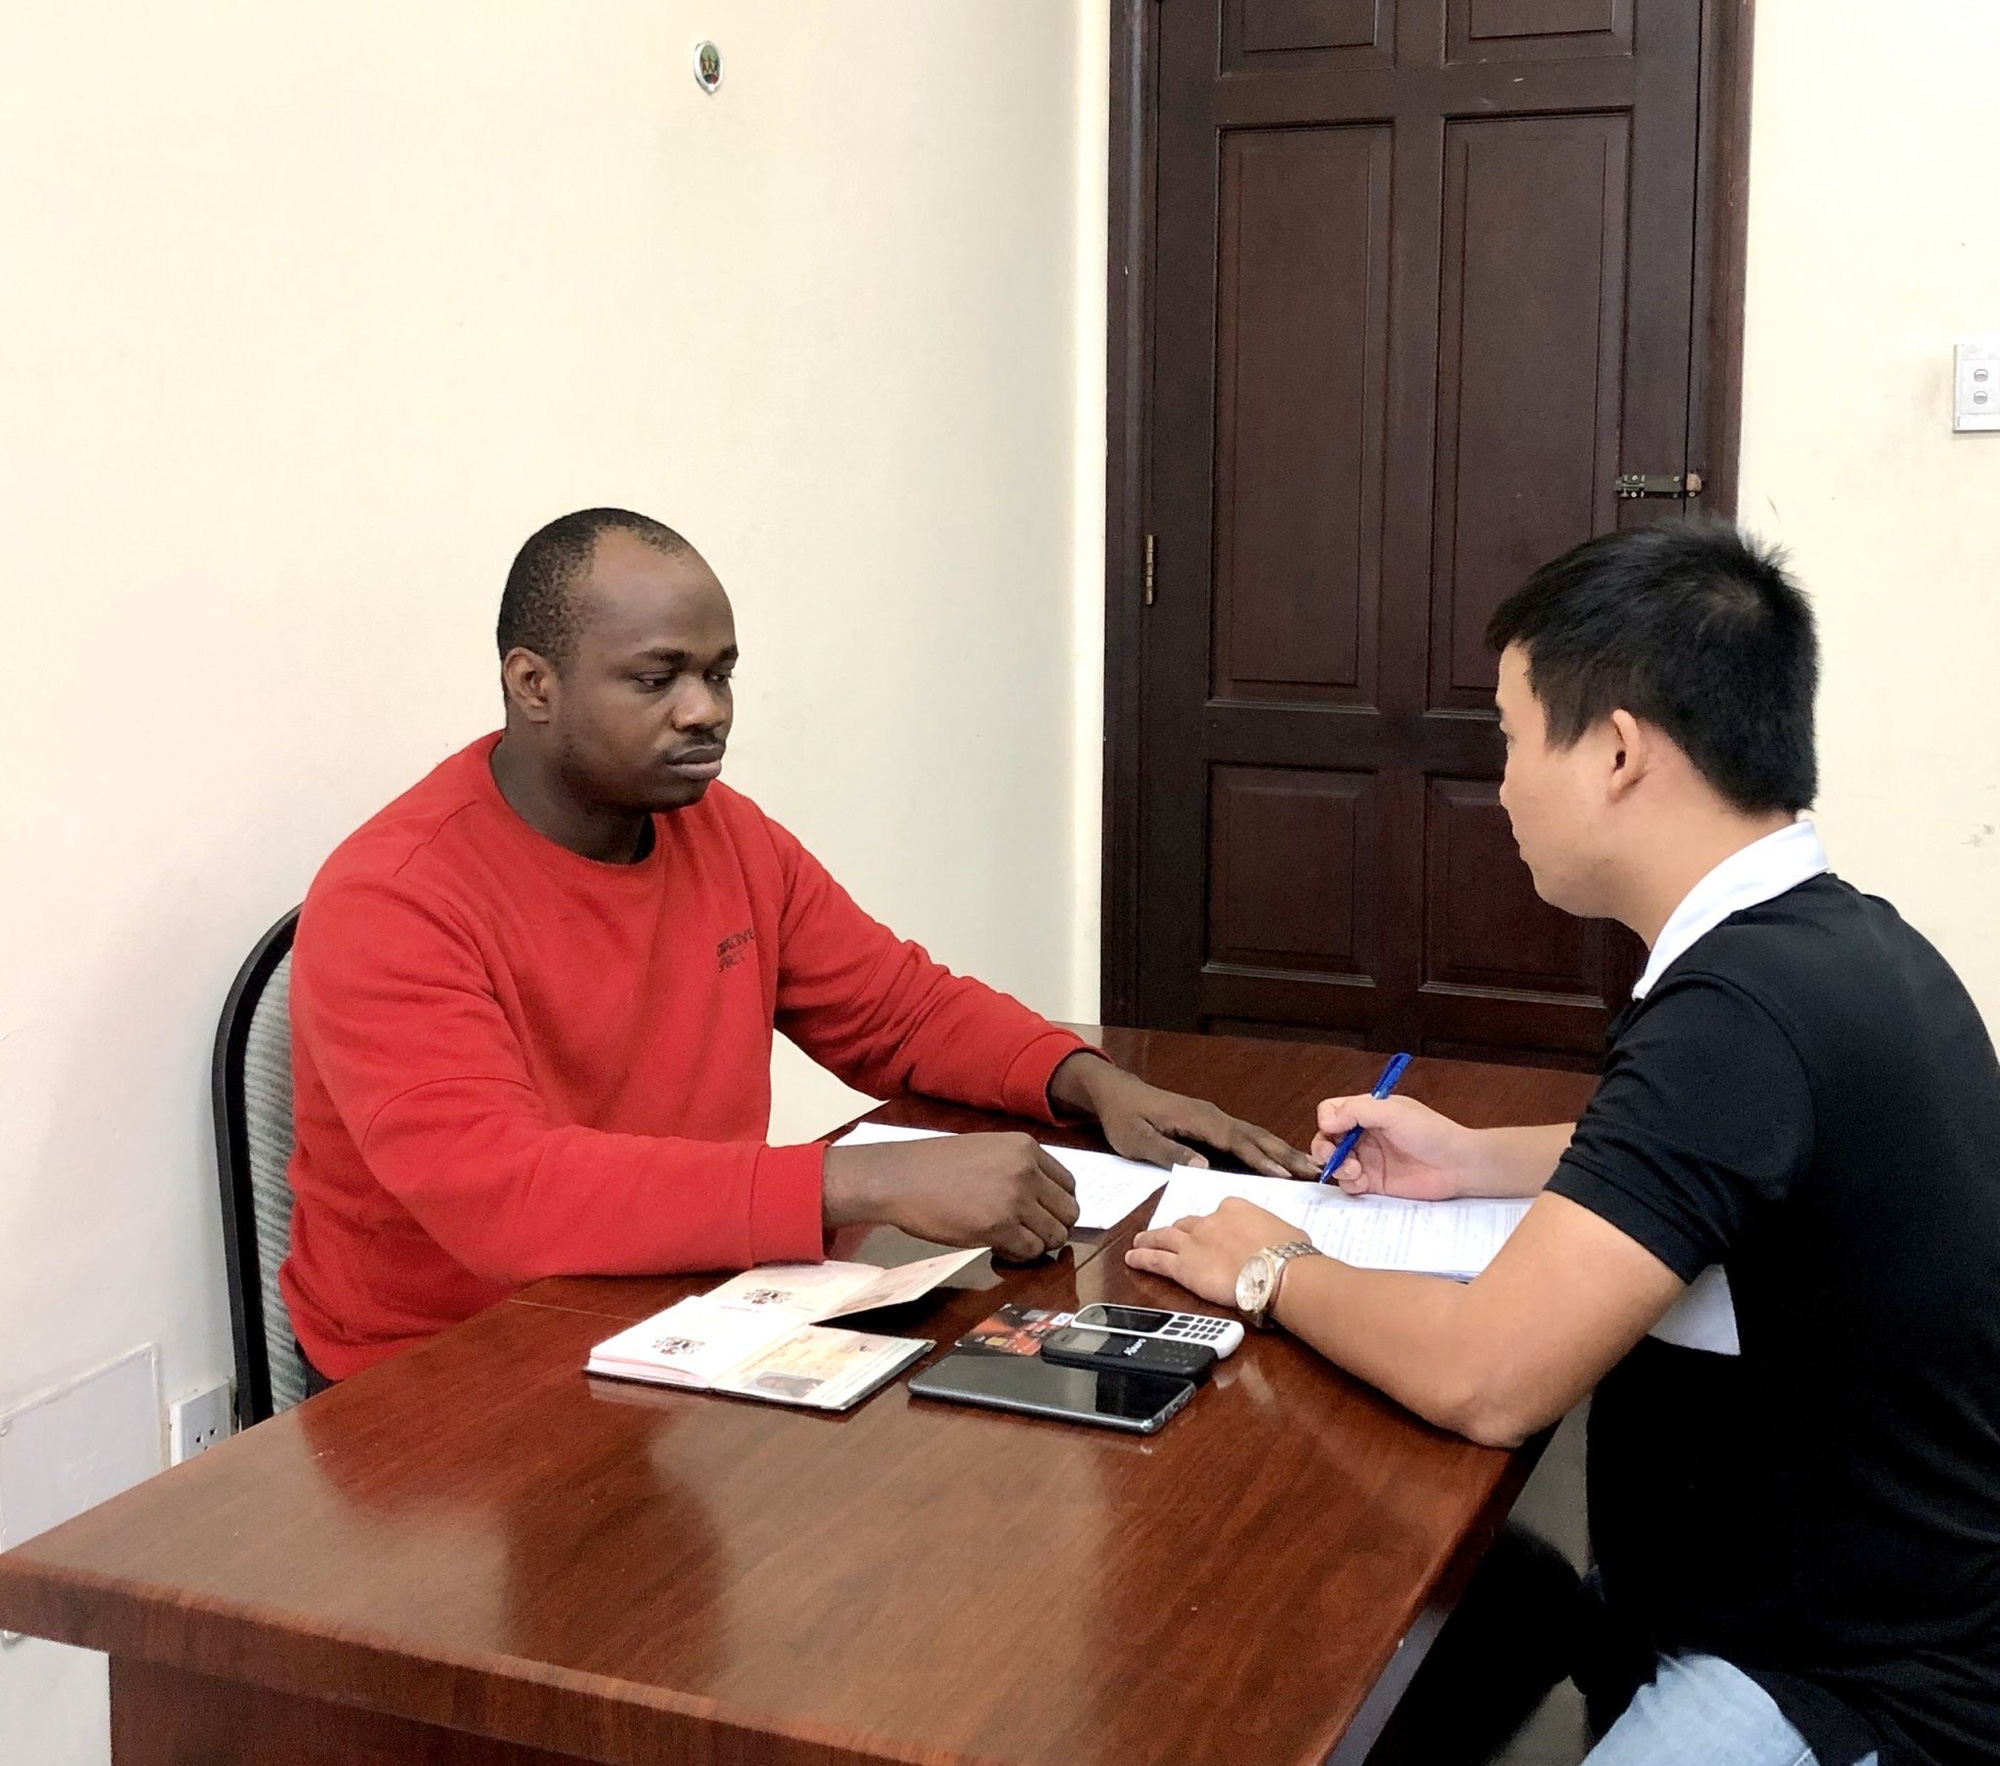 Multinational fraud ring arrested for social media scam targeting Vietnamese